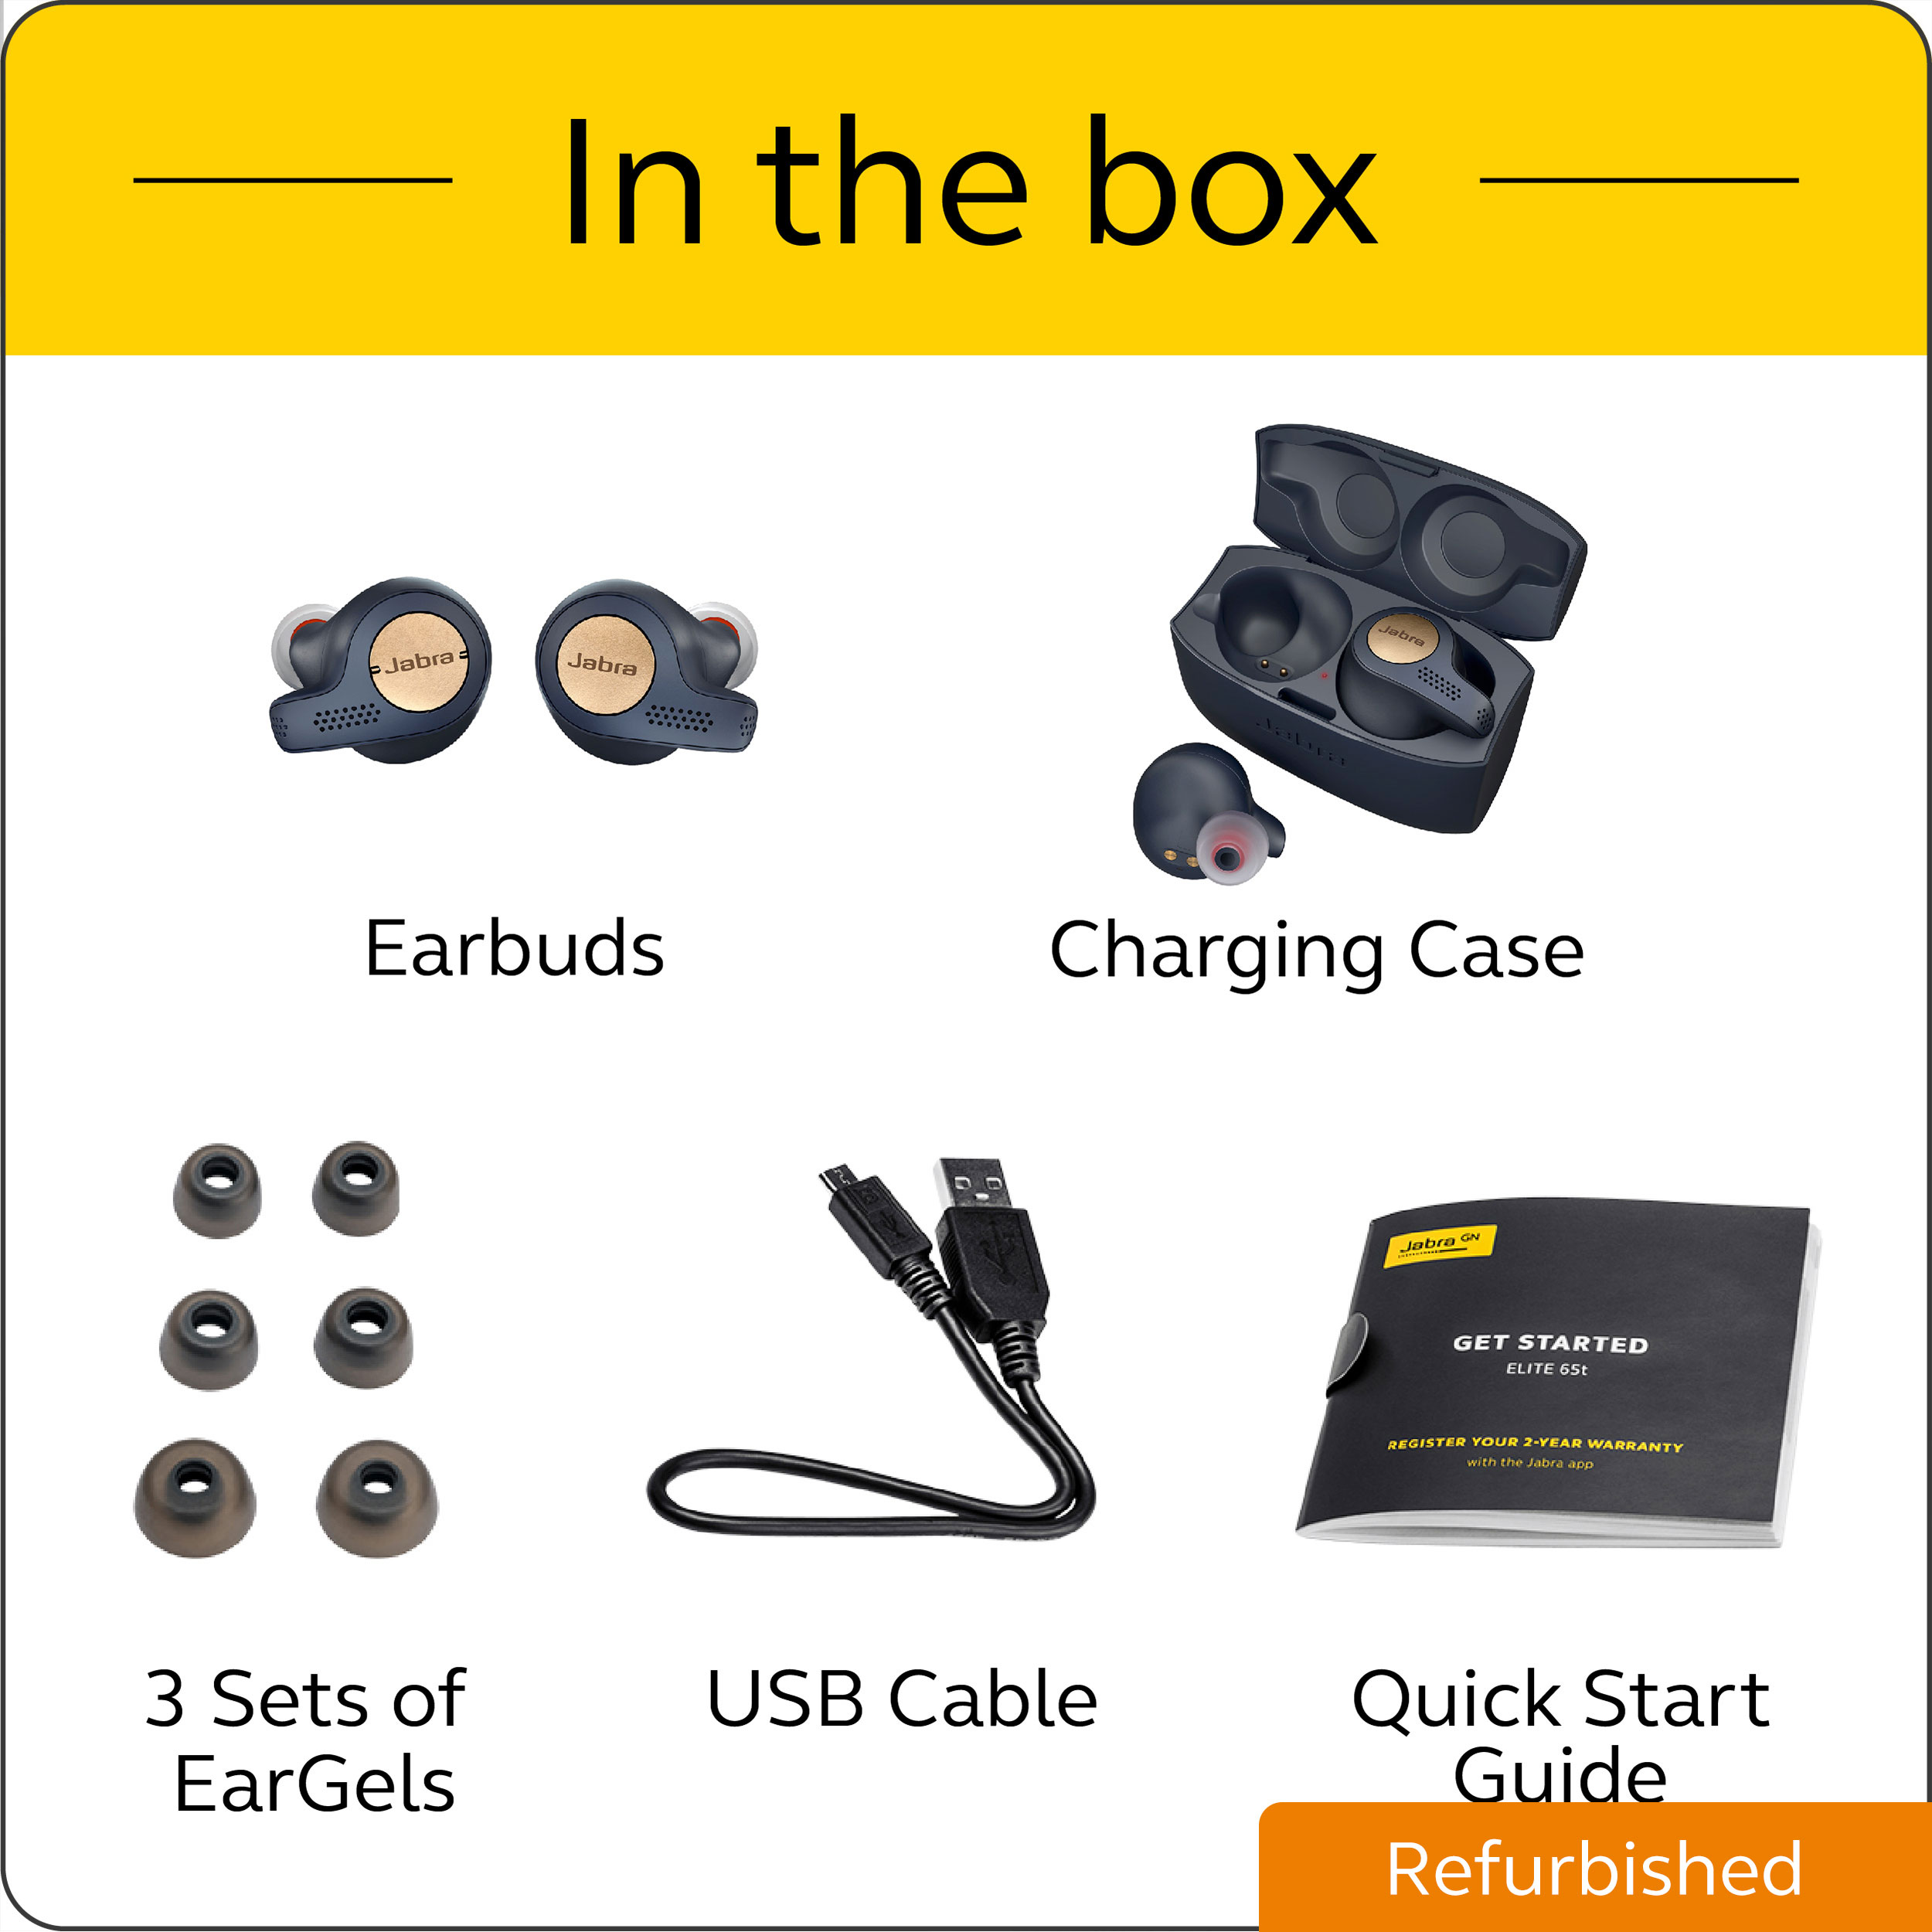 thumbnail 17 - Jabra Elite Active 65t True Wireless Earbuds (Certified Refurbished)